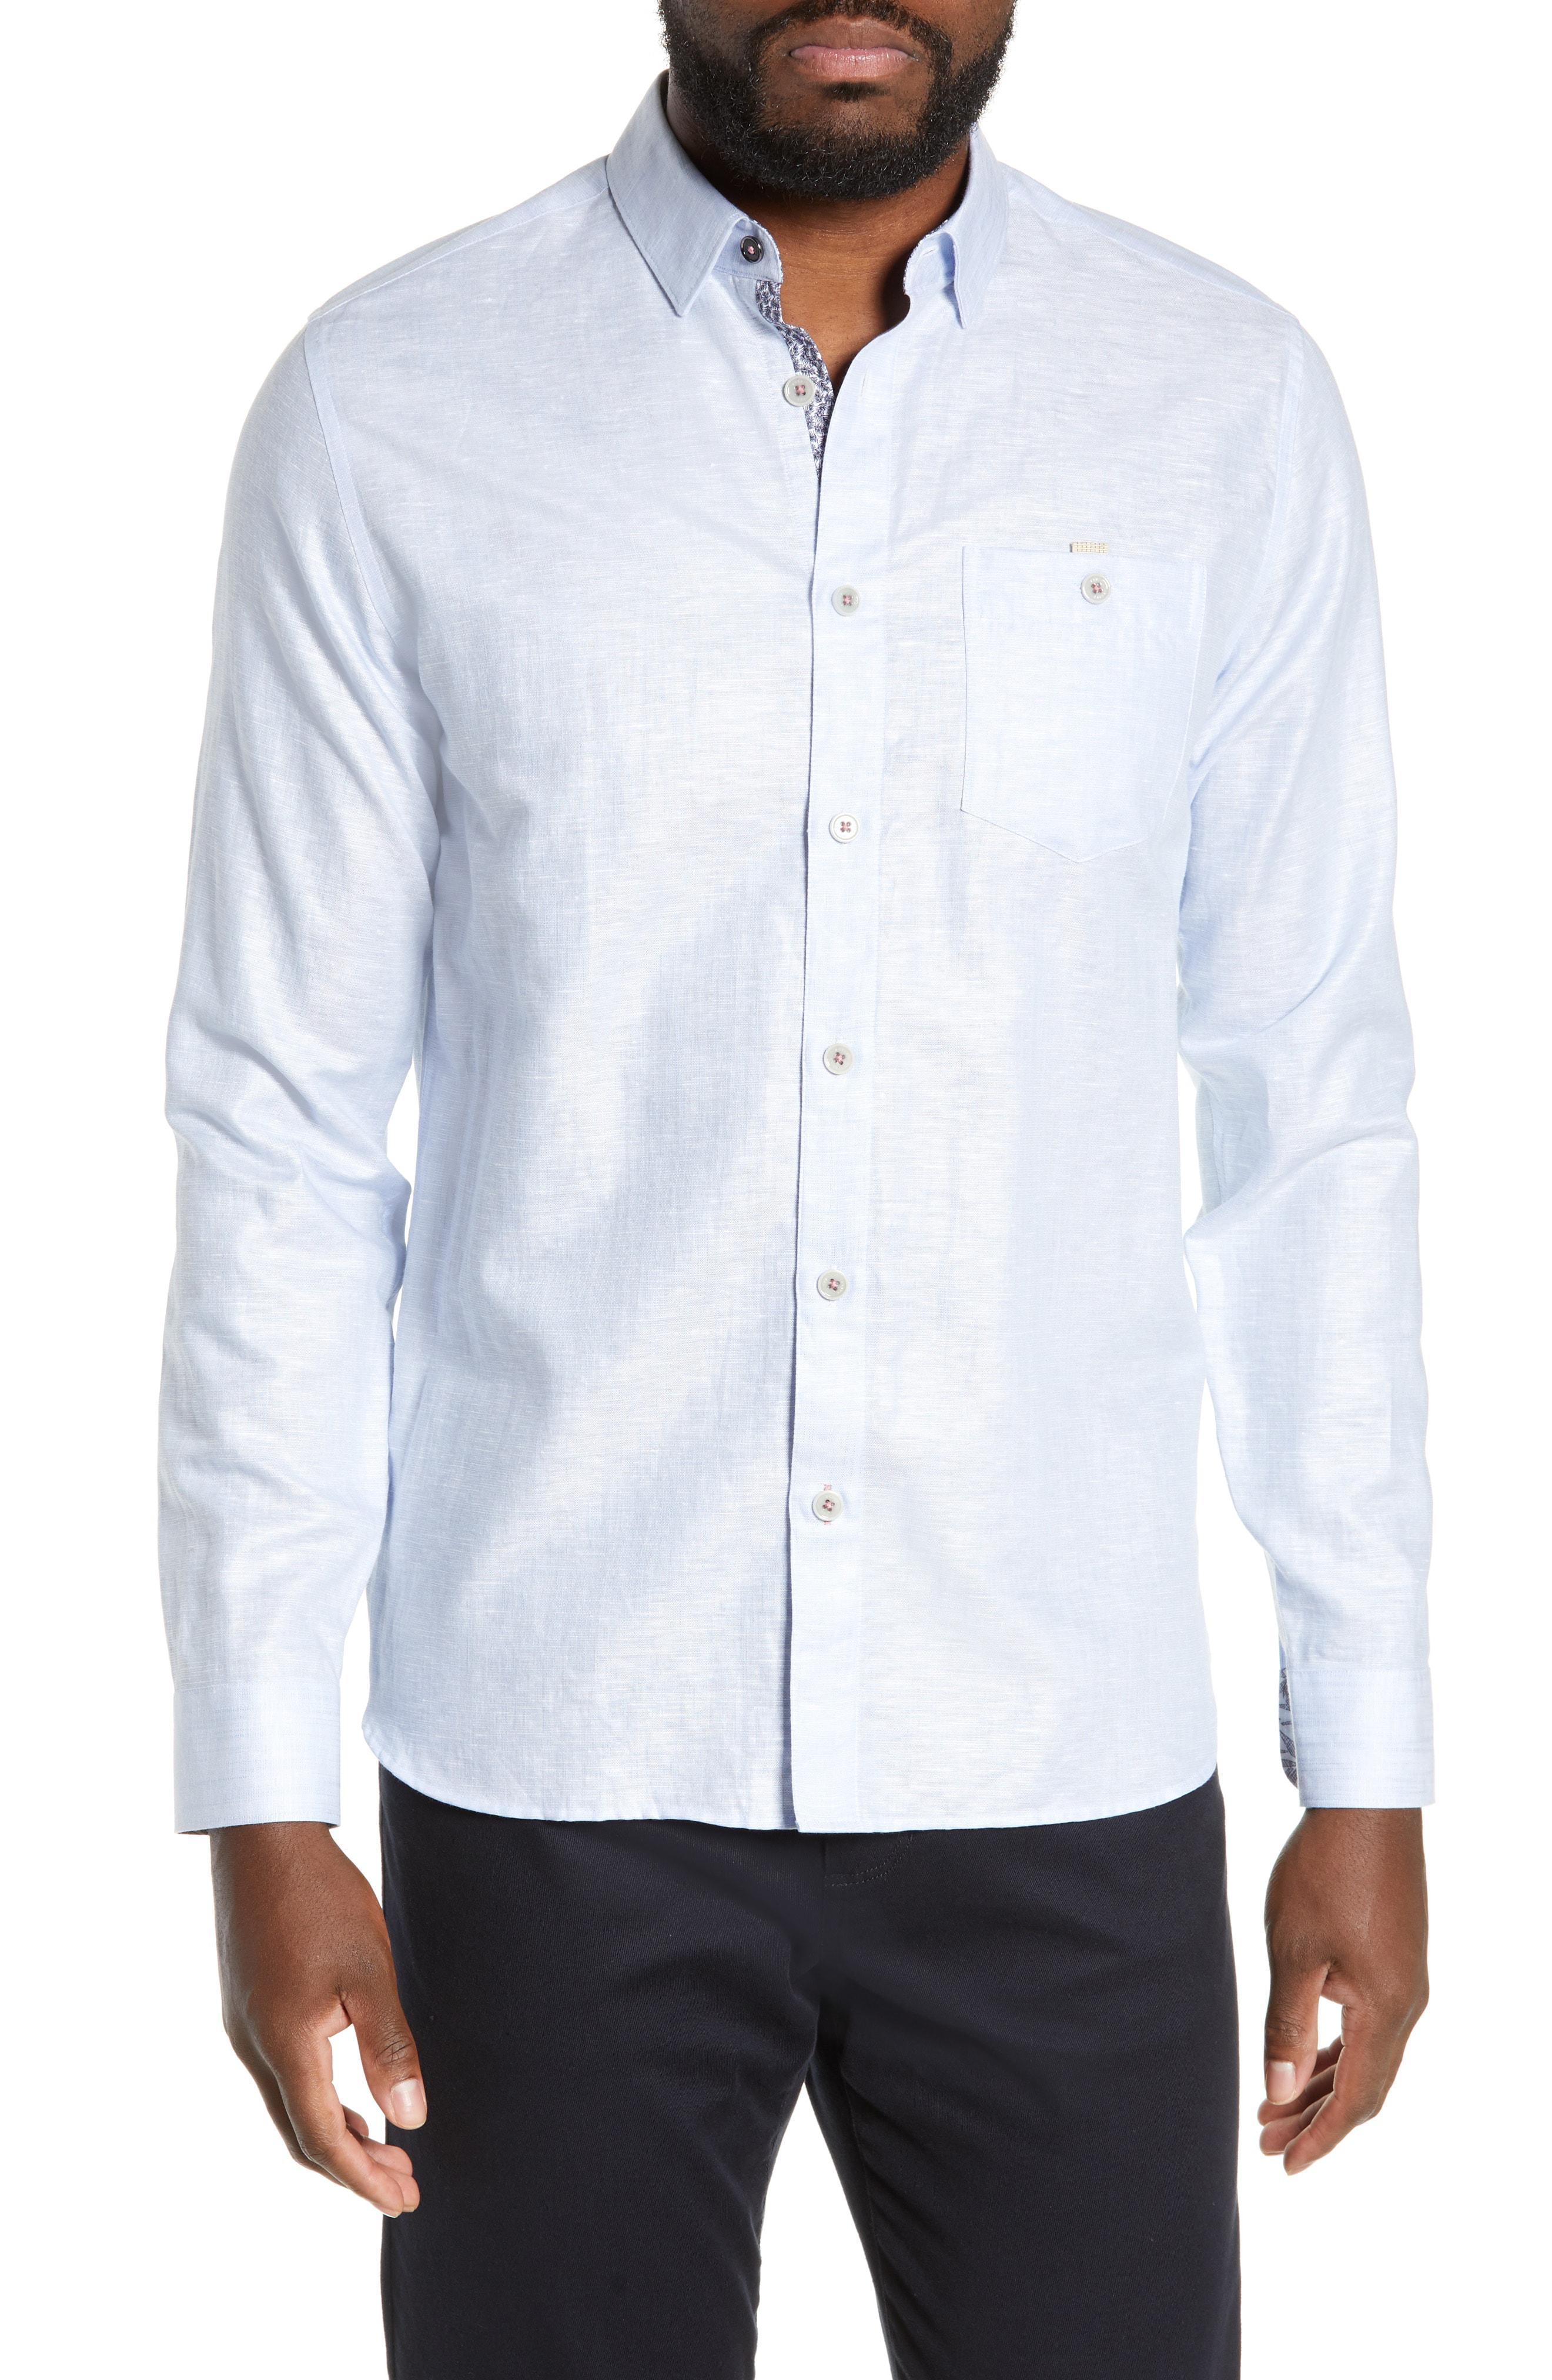 fbcce9f7db09 Ted Baker Emuu Slim Fit Linen Shirt In Light Blue